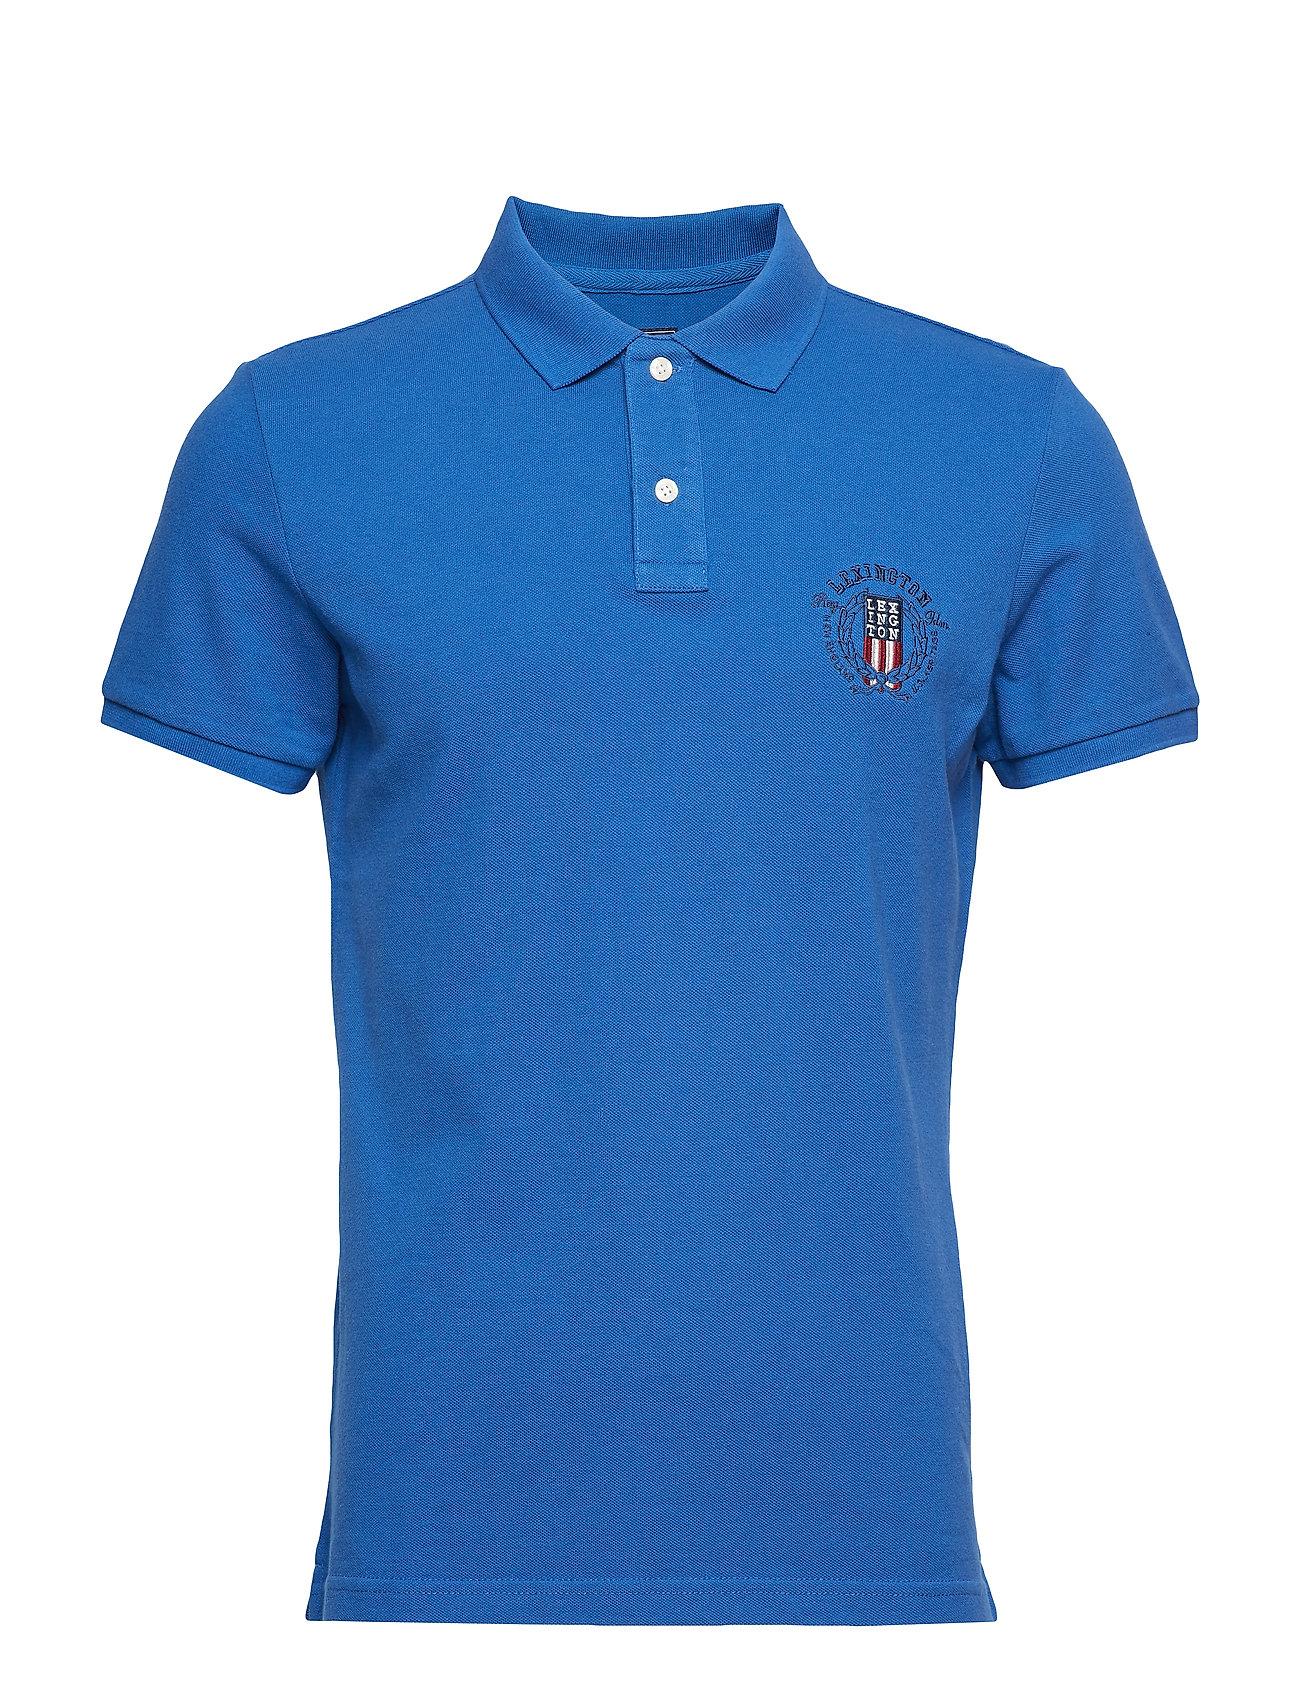 Lexington Clothing Oscar Polo - TRUE BLUE